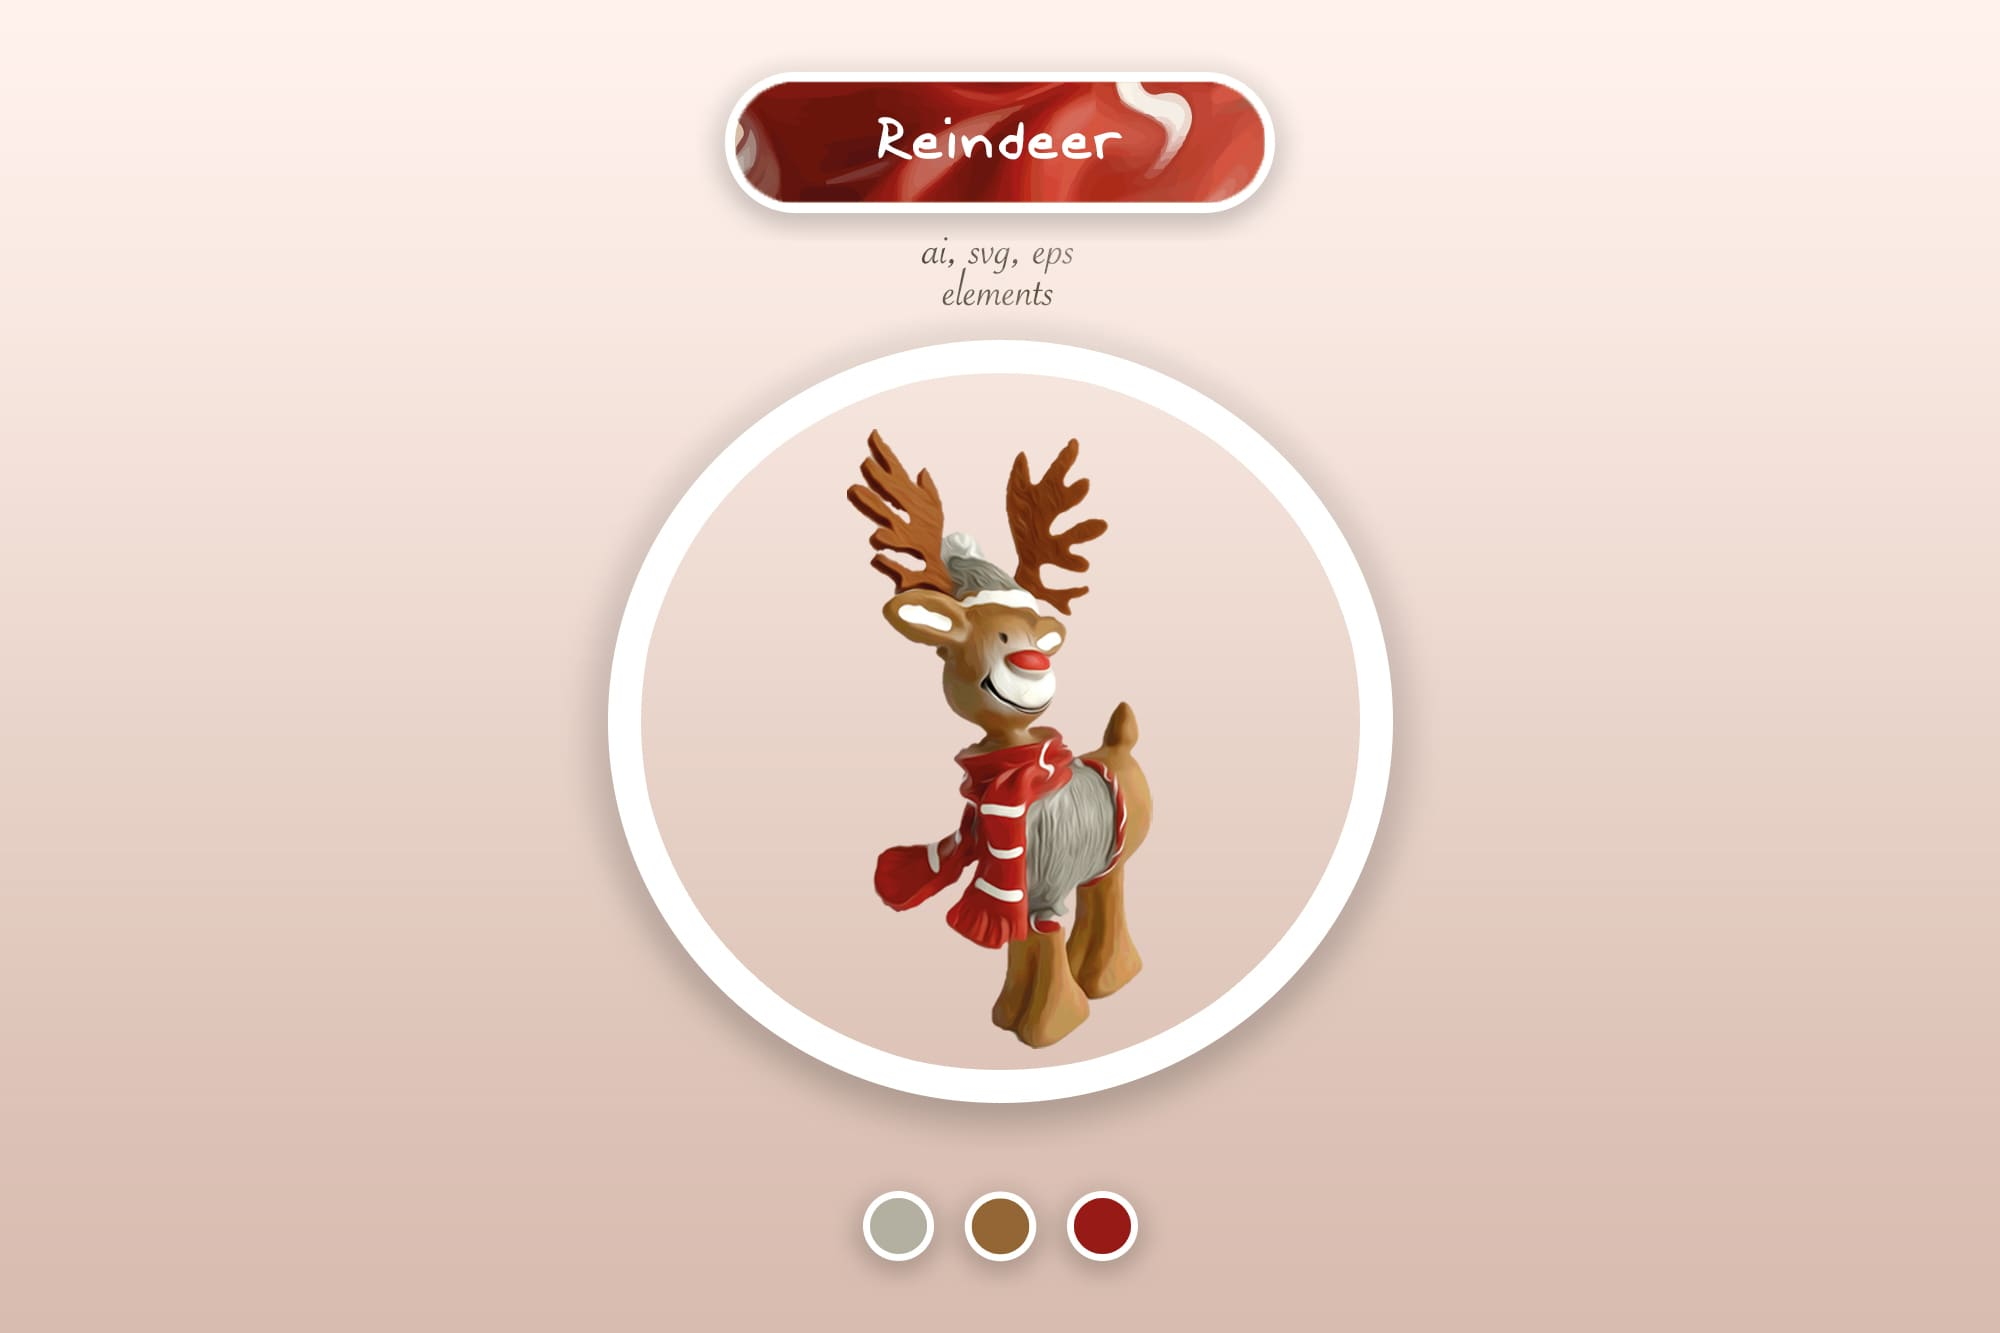 496 Christmas Illustrations: Christmas Vectors Bundle SVG, EPS, AI - Reindeer a